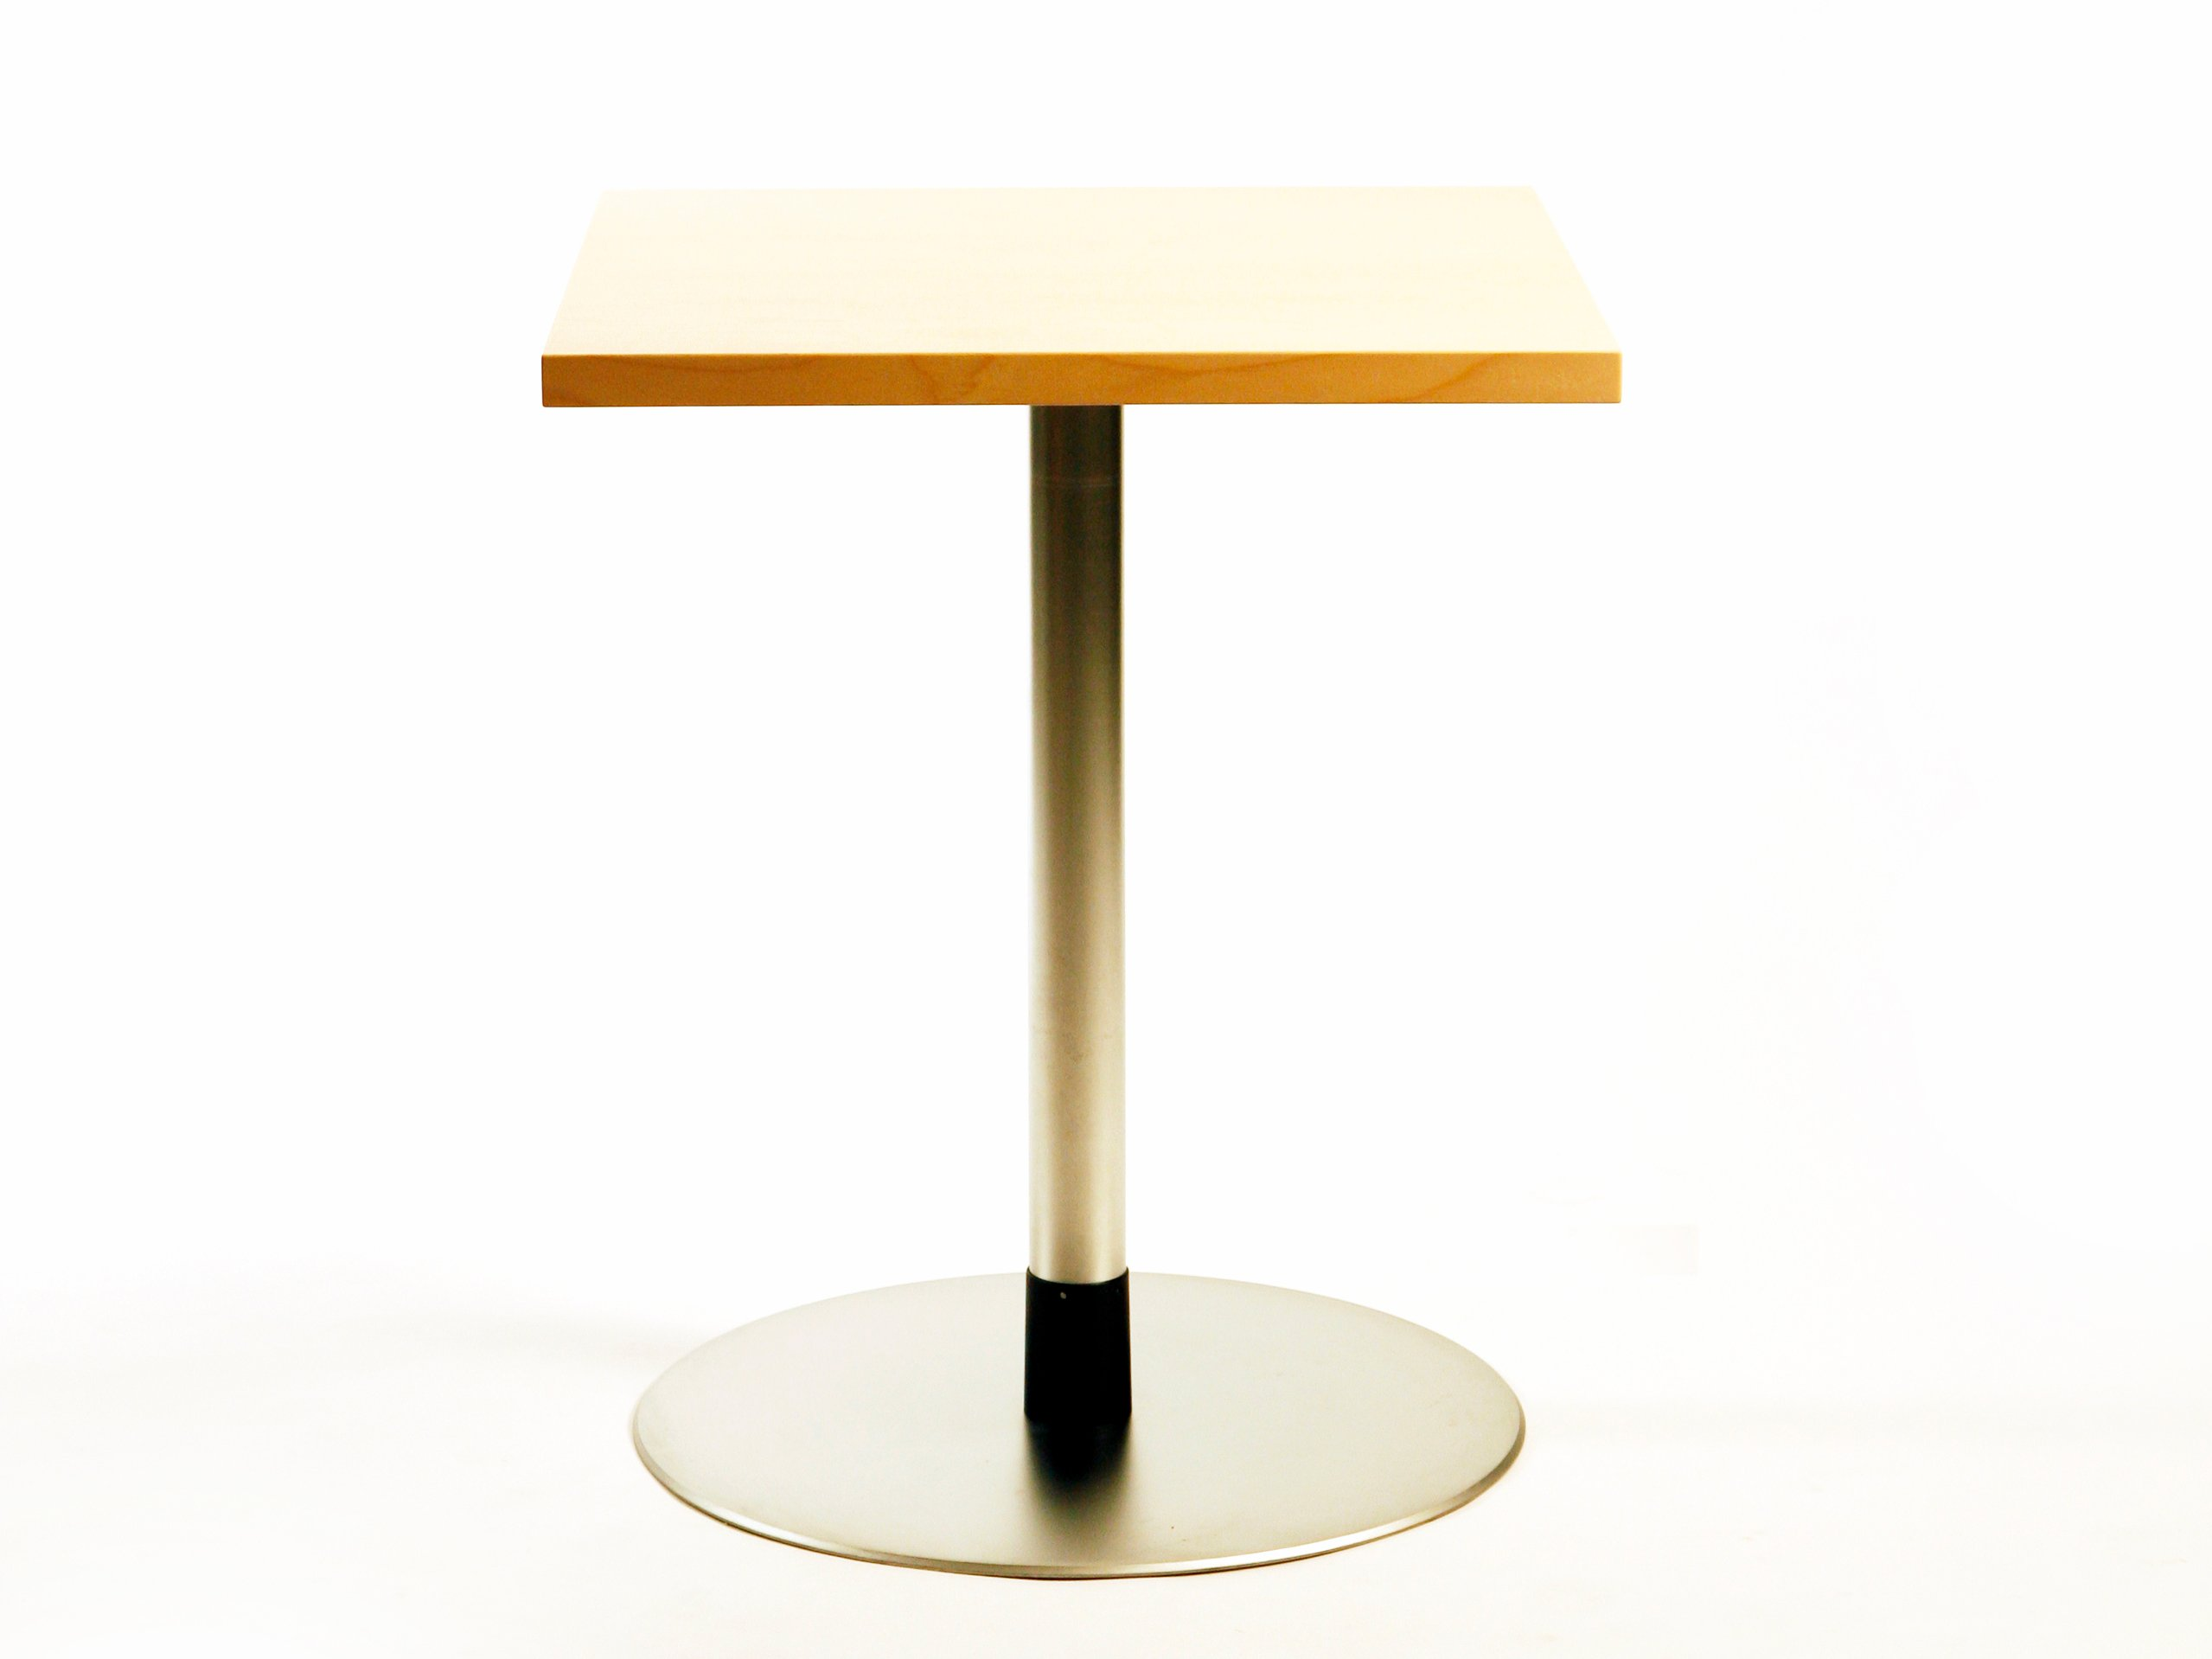 table ronde pour chr hippo by inno interior oy design harri korhonen. Black Bedroom Furniture Sets. Home Design Ideas